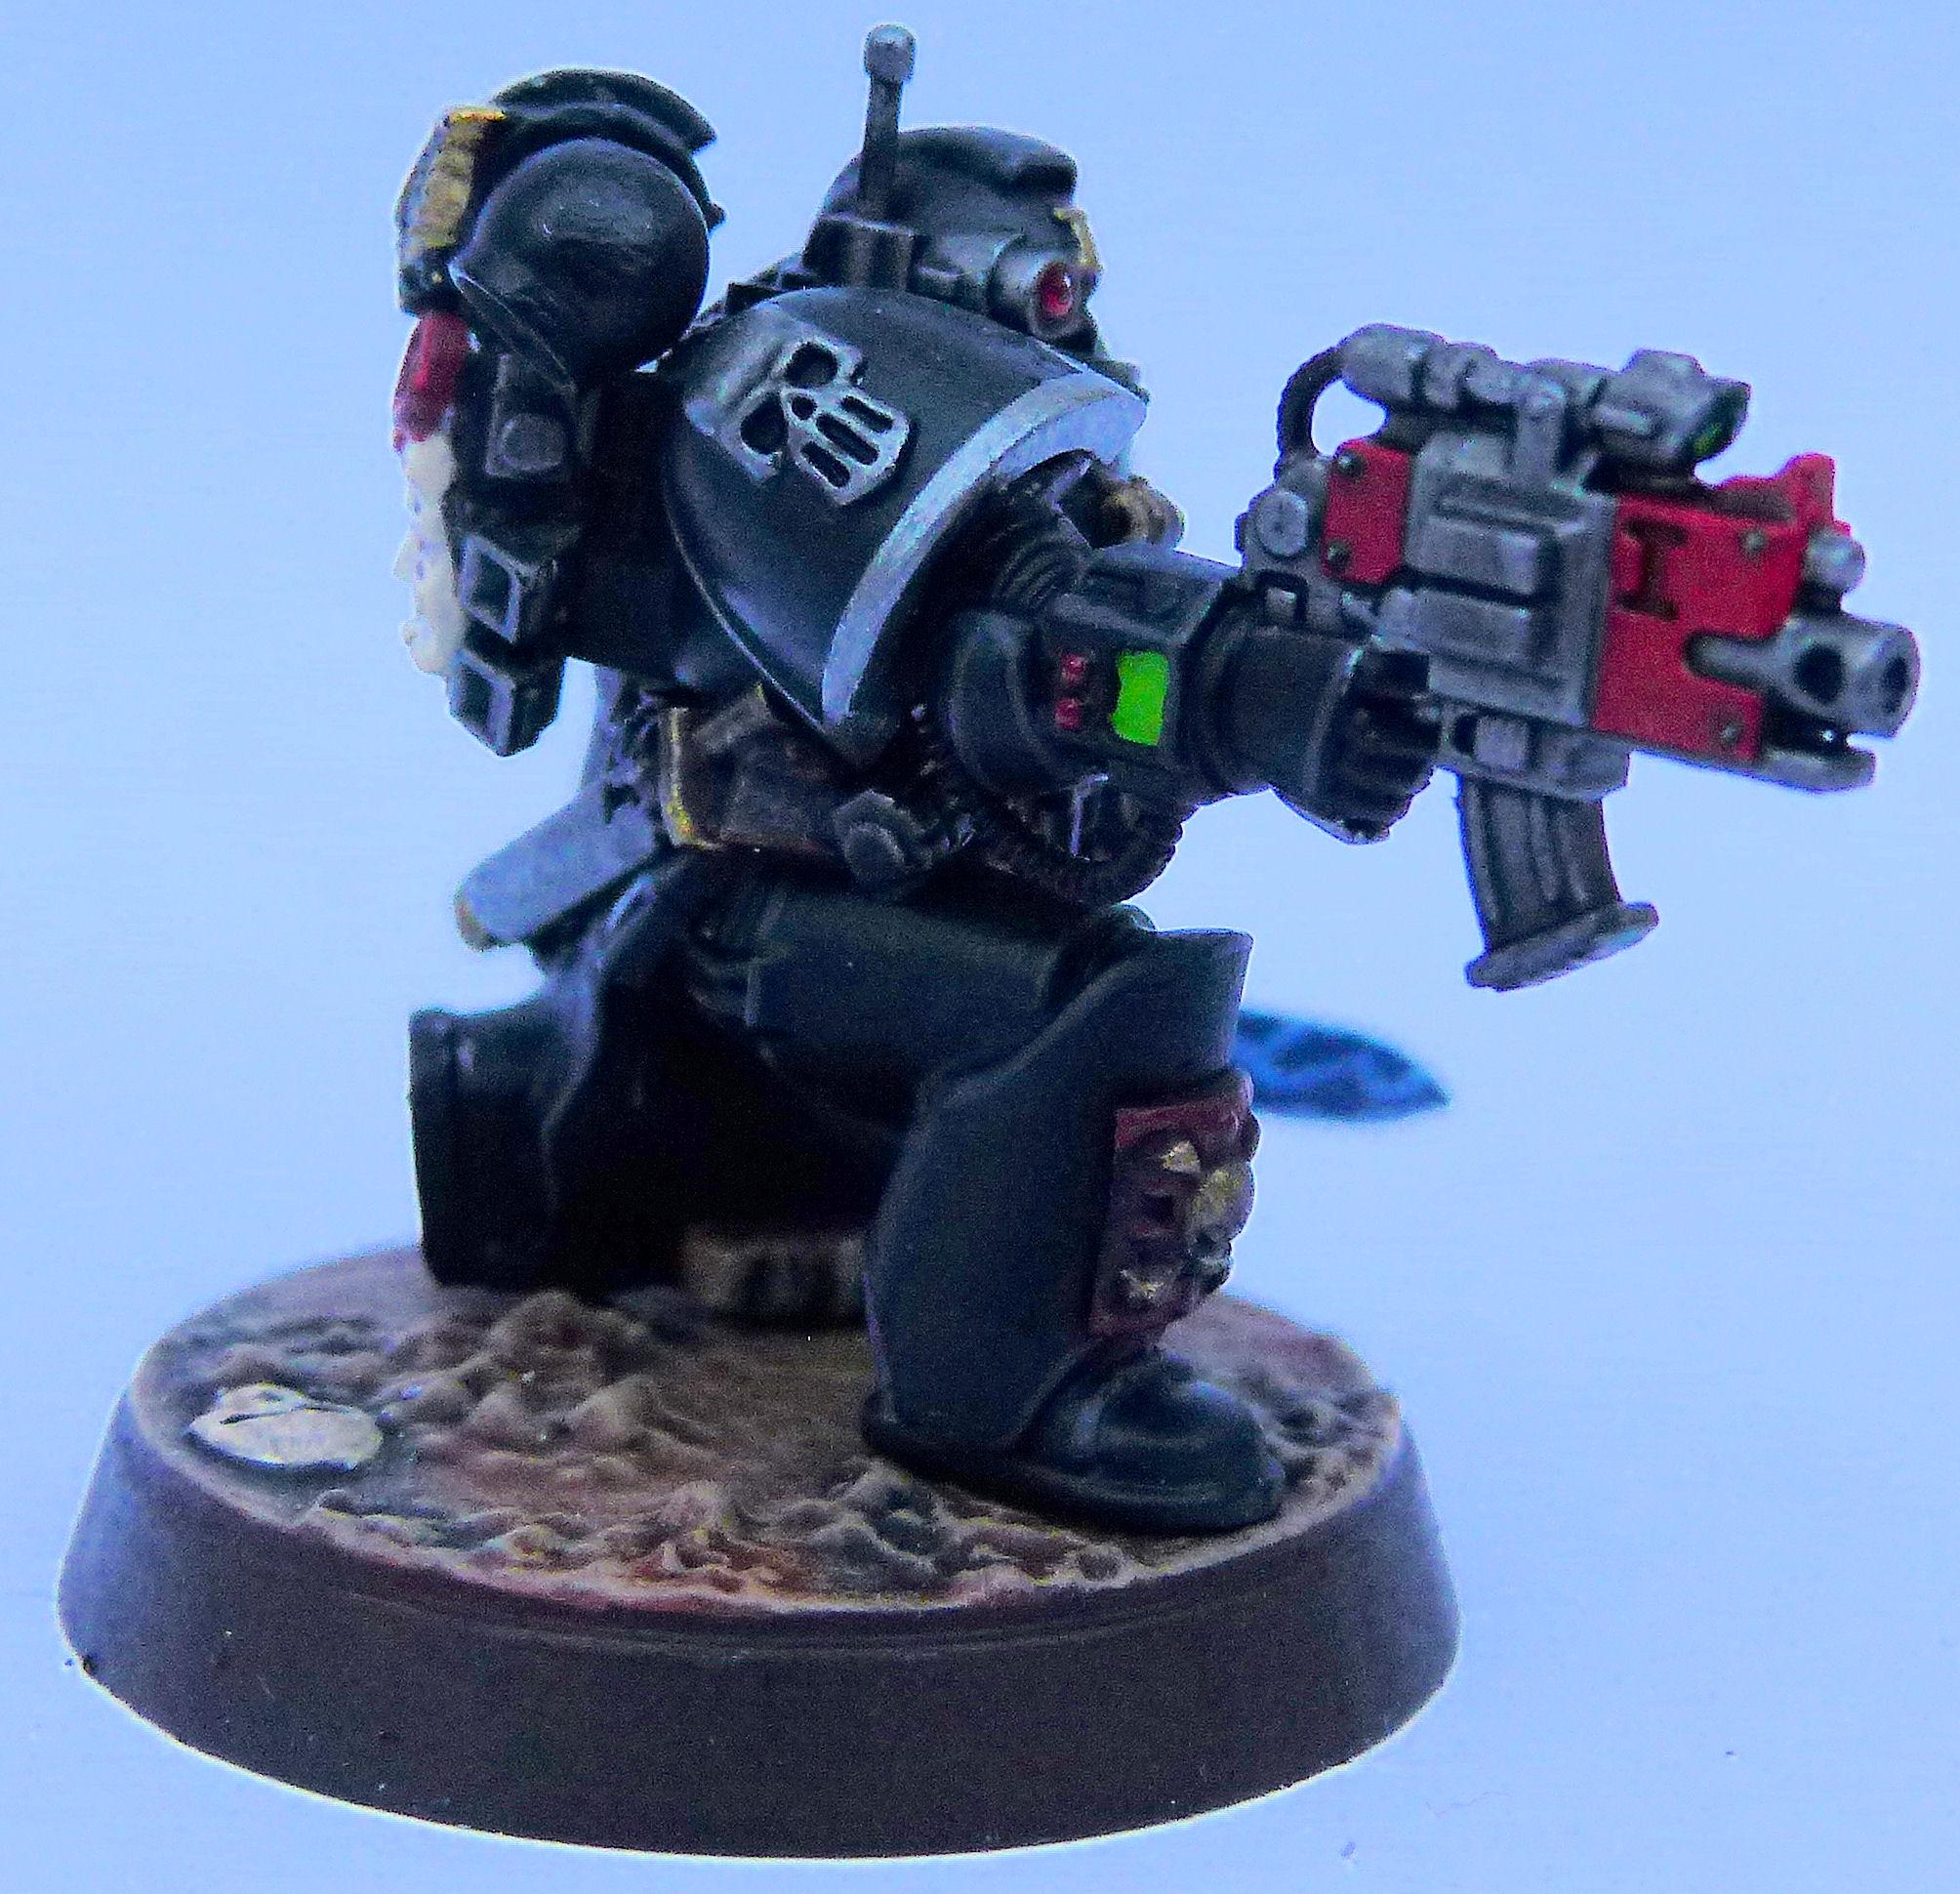 Silver Skulls Deathwatch Right Side